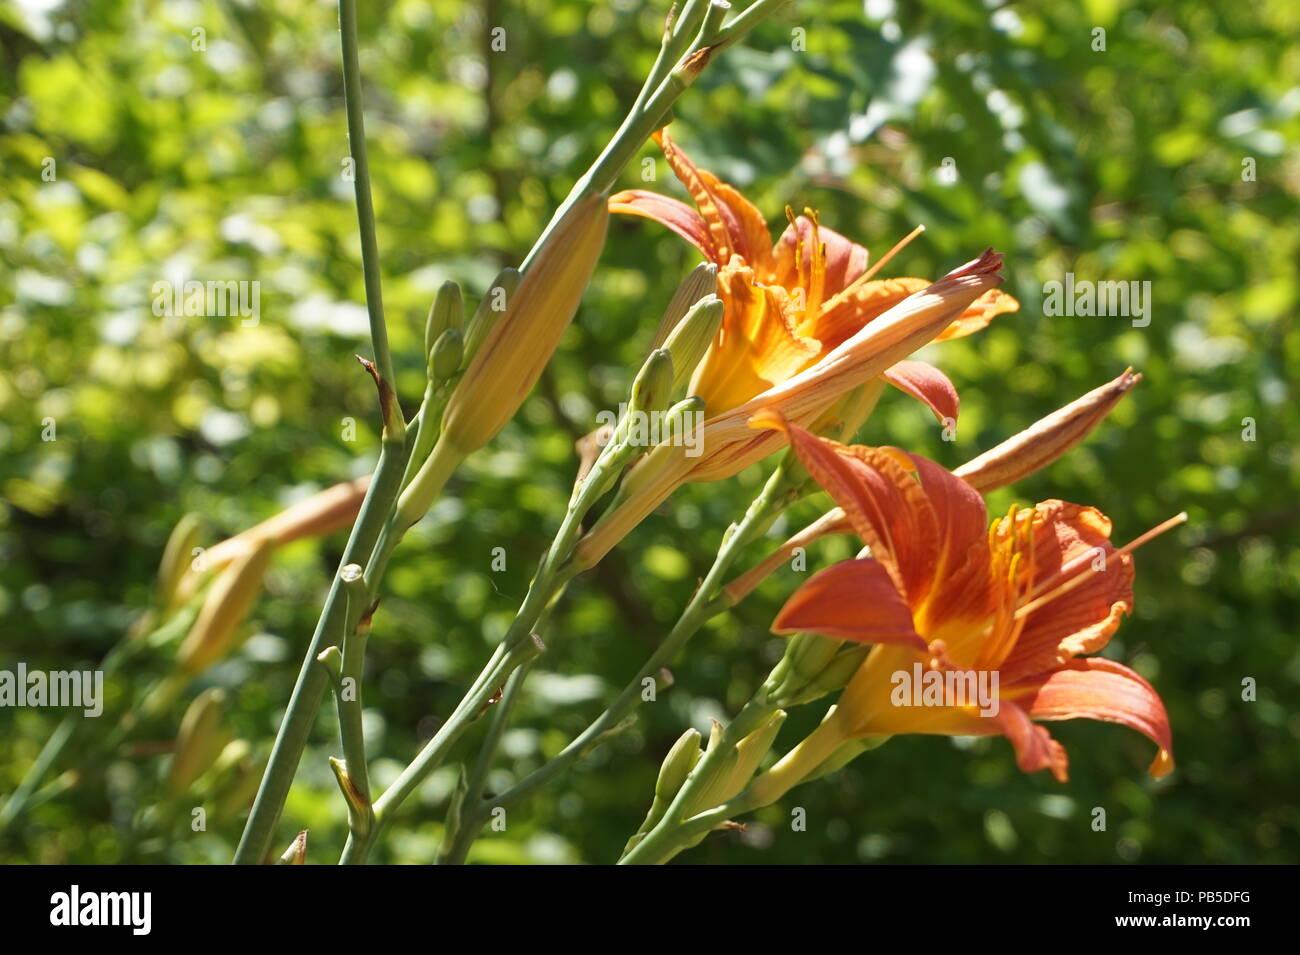 Wild Orange Lilies Stockfotos & Wild Orange Lilies Bilder - Alamy